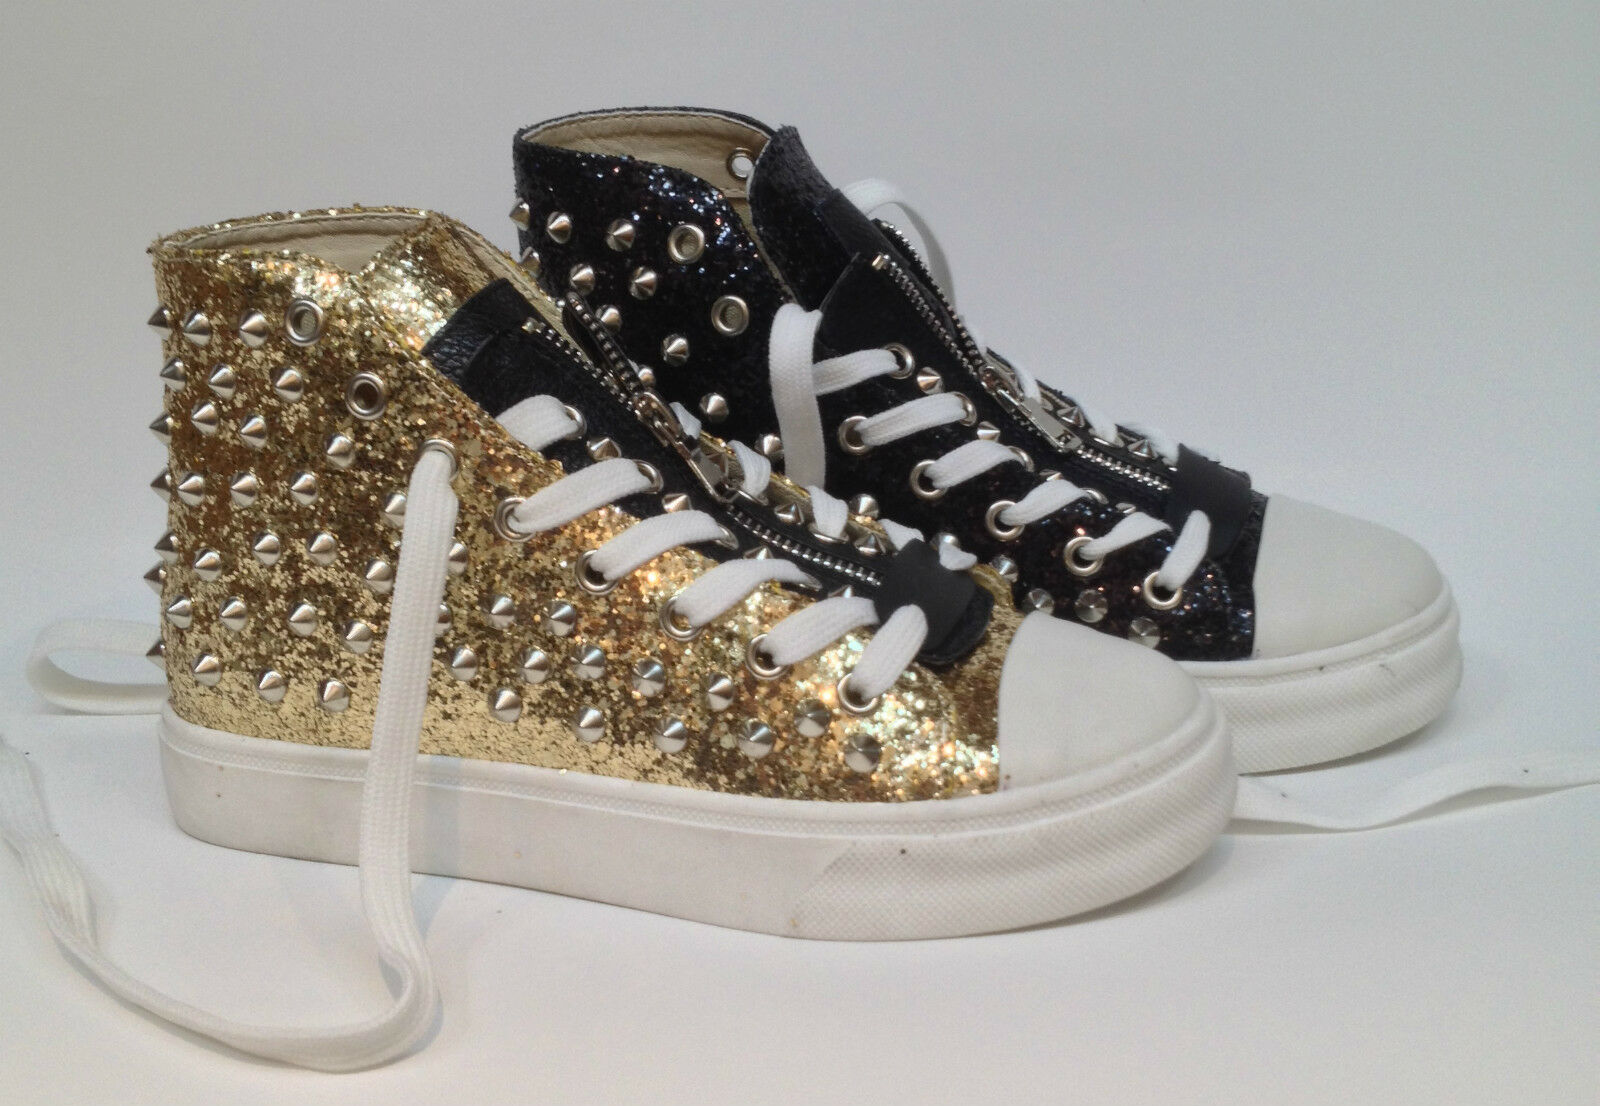 SNEAKERS schuhe Damens Damenschuhe Schuhe ZAPATOS GLITTER 35 36 37 38 39 40 41 BORCHIE